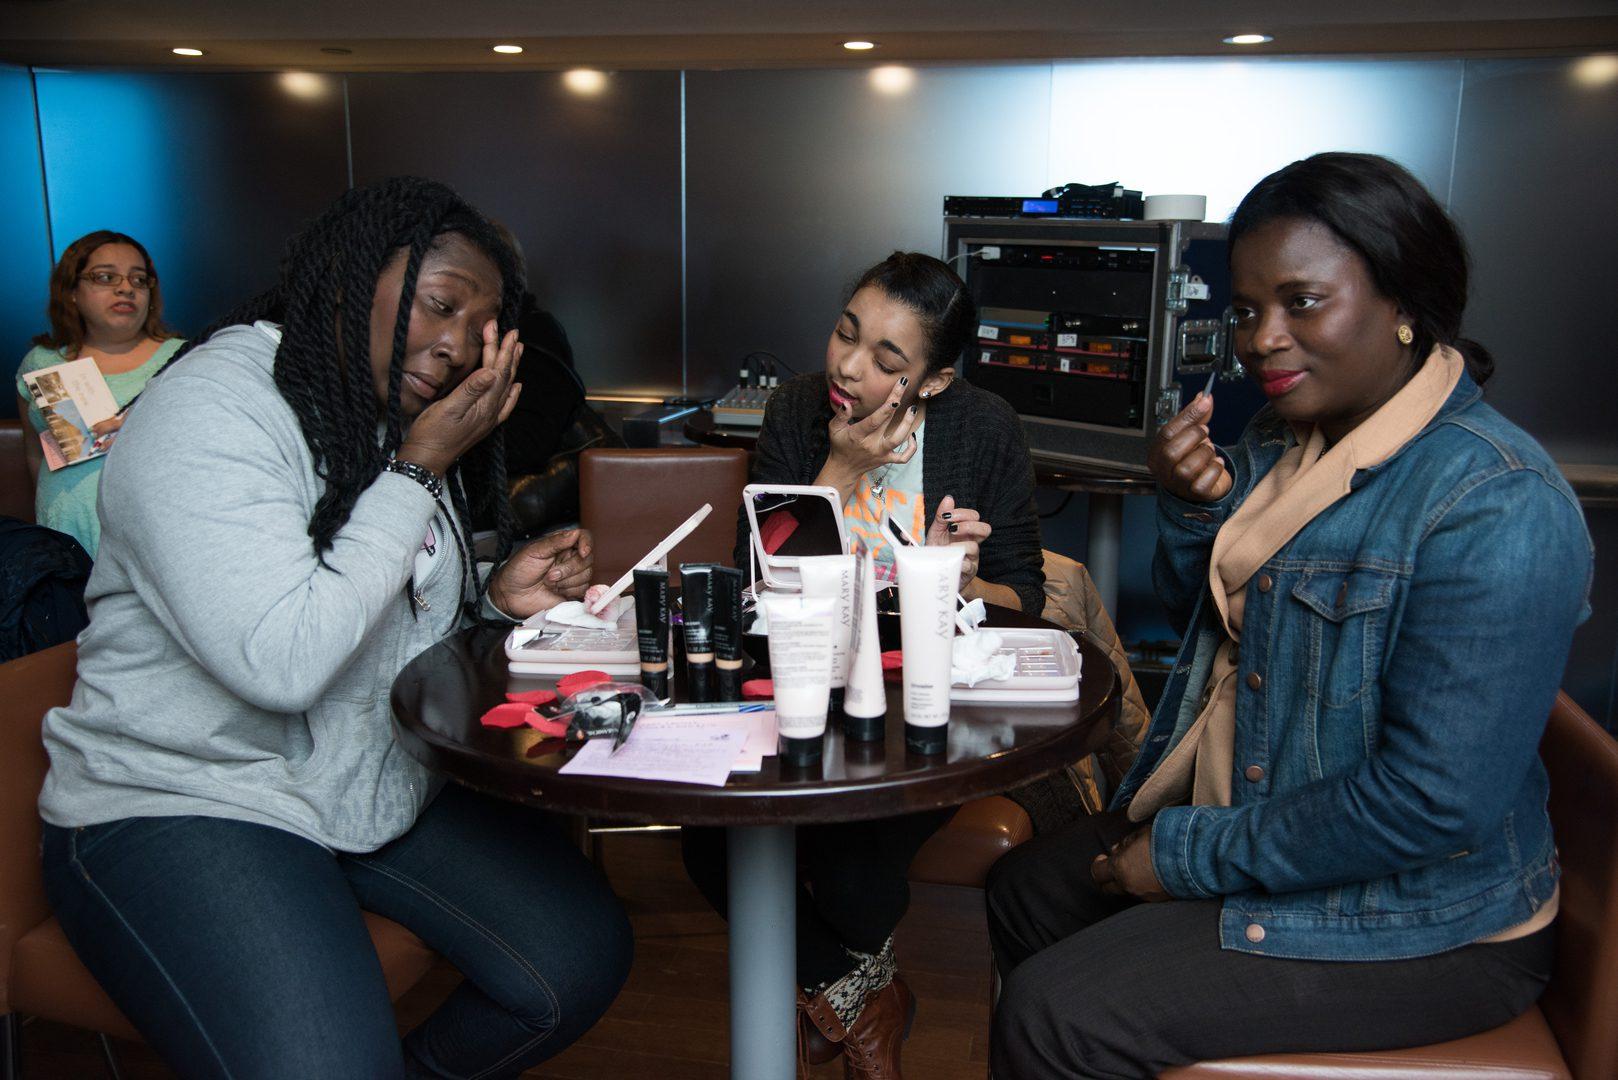 Women putting on makeup